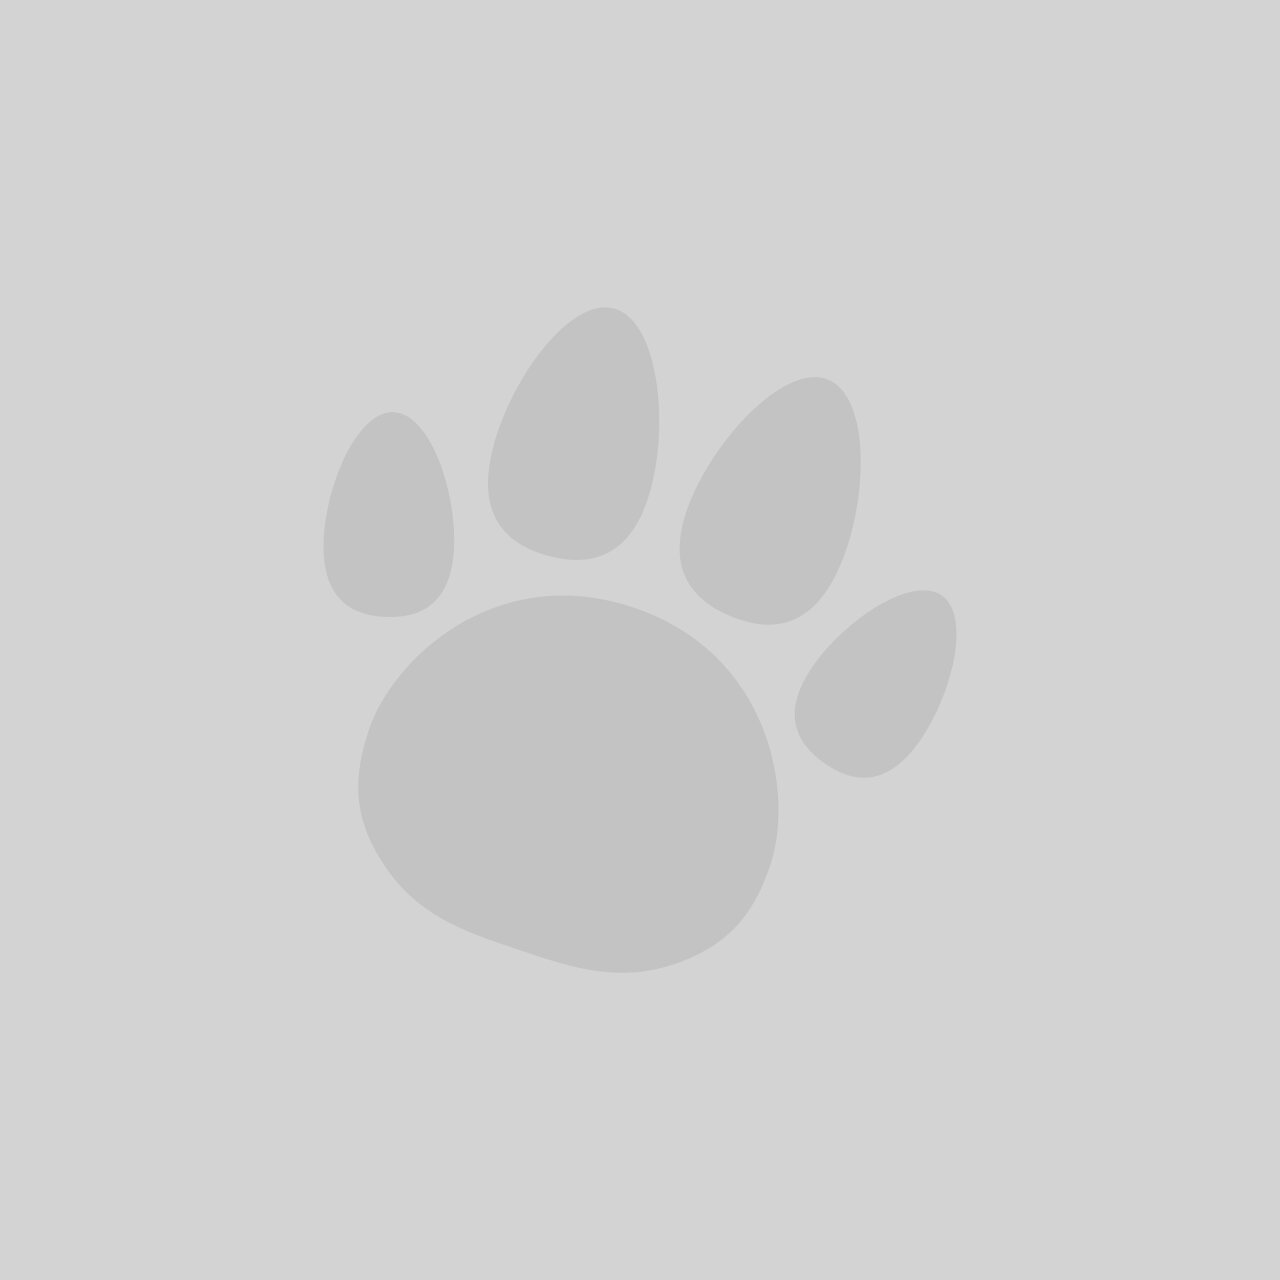 Doodlebone Bold Range Lead Teal (size options)